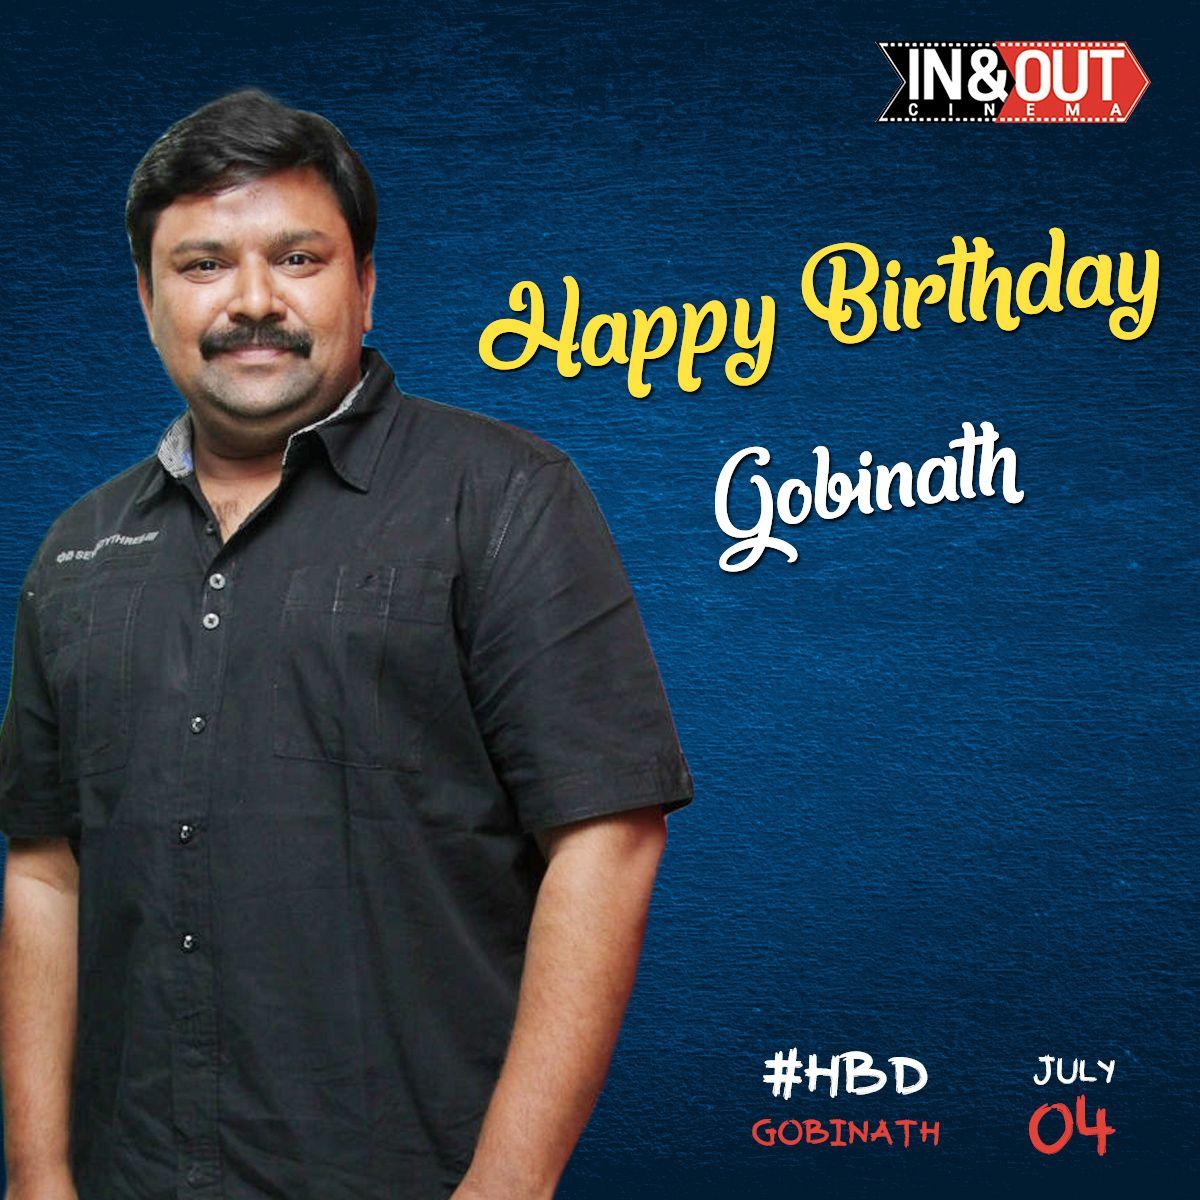 Wishing a very Happy Birthday to Gobinath